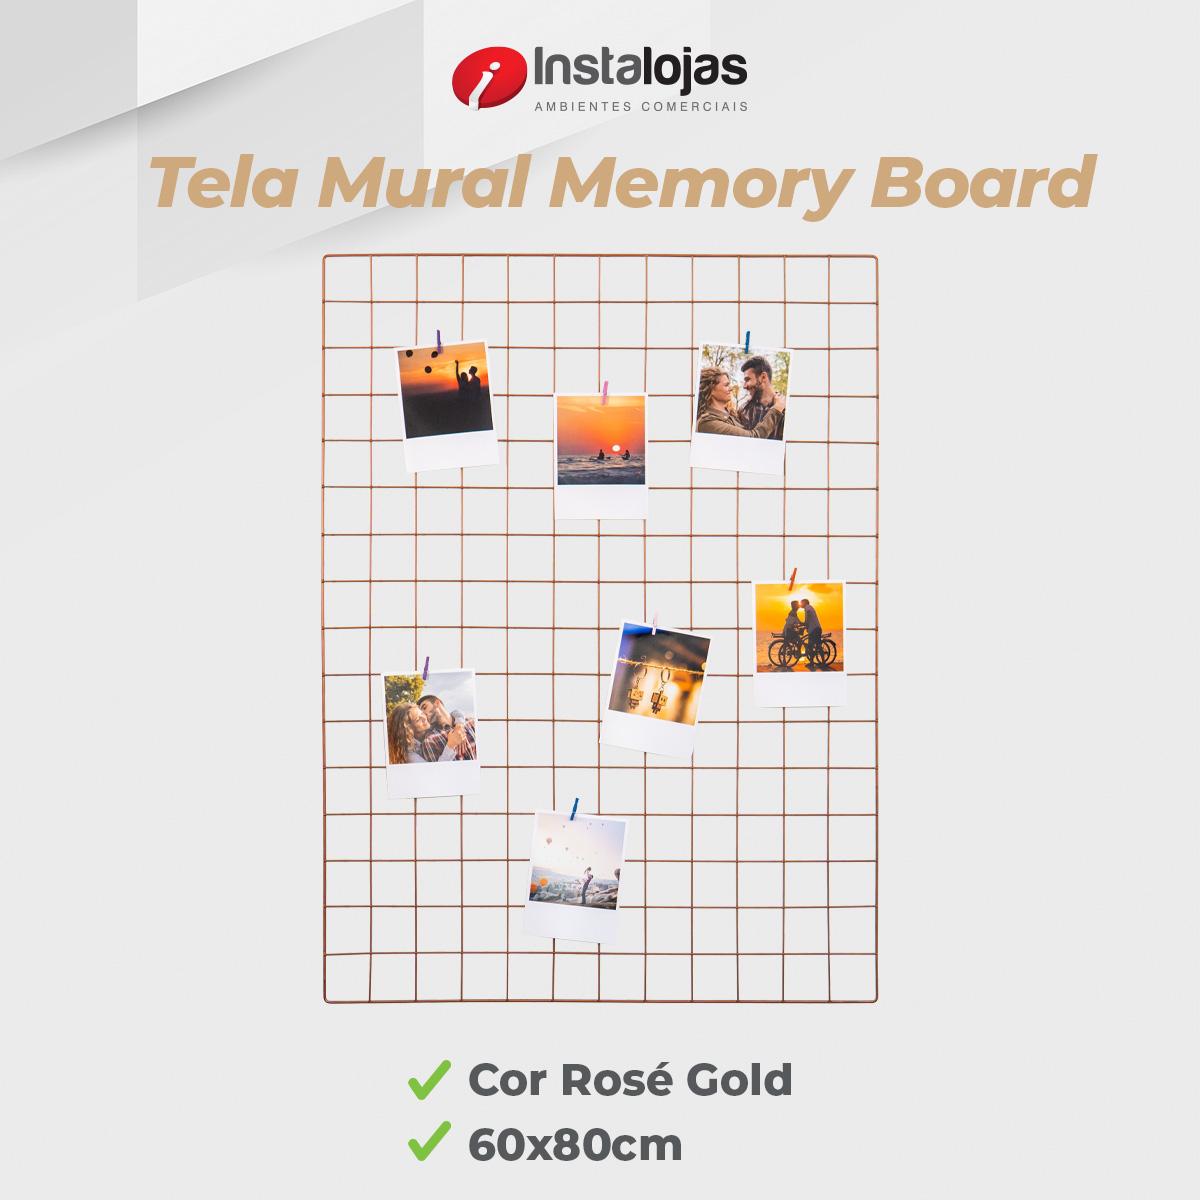 Kit Tela 60x80cm Rosé Gold + 10 Prendedores Cores Sortidas